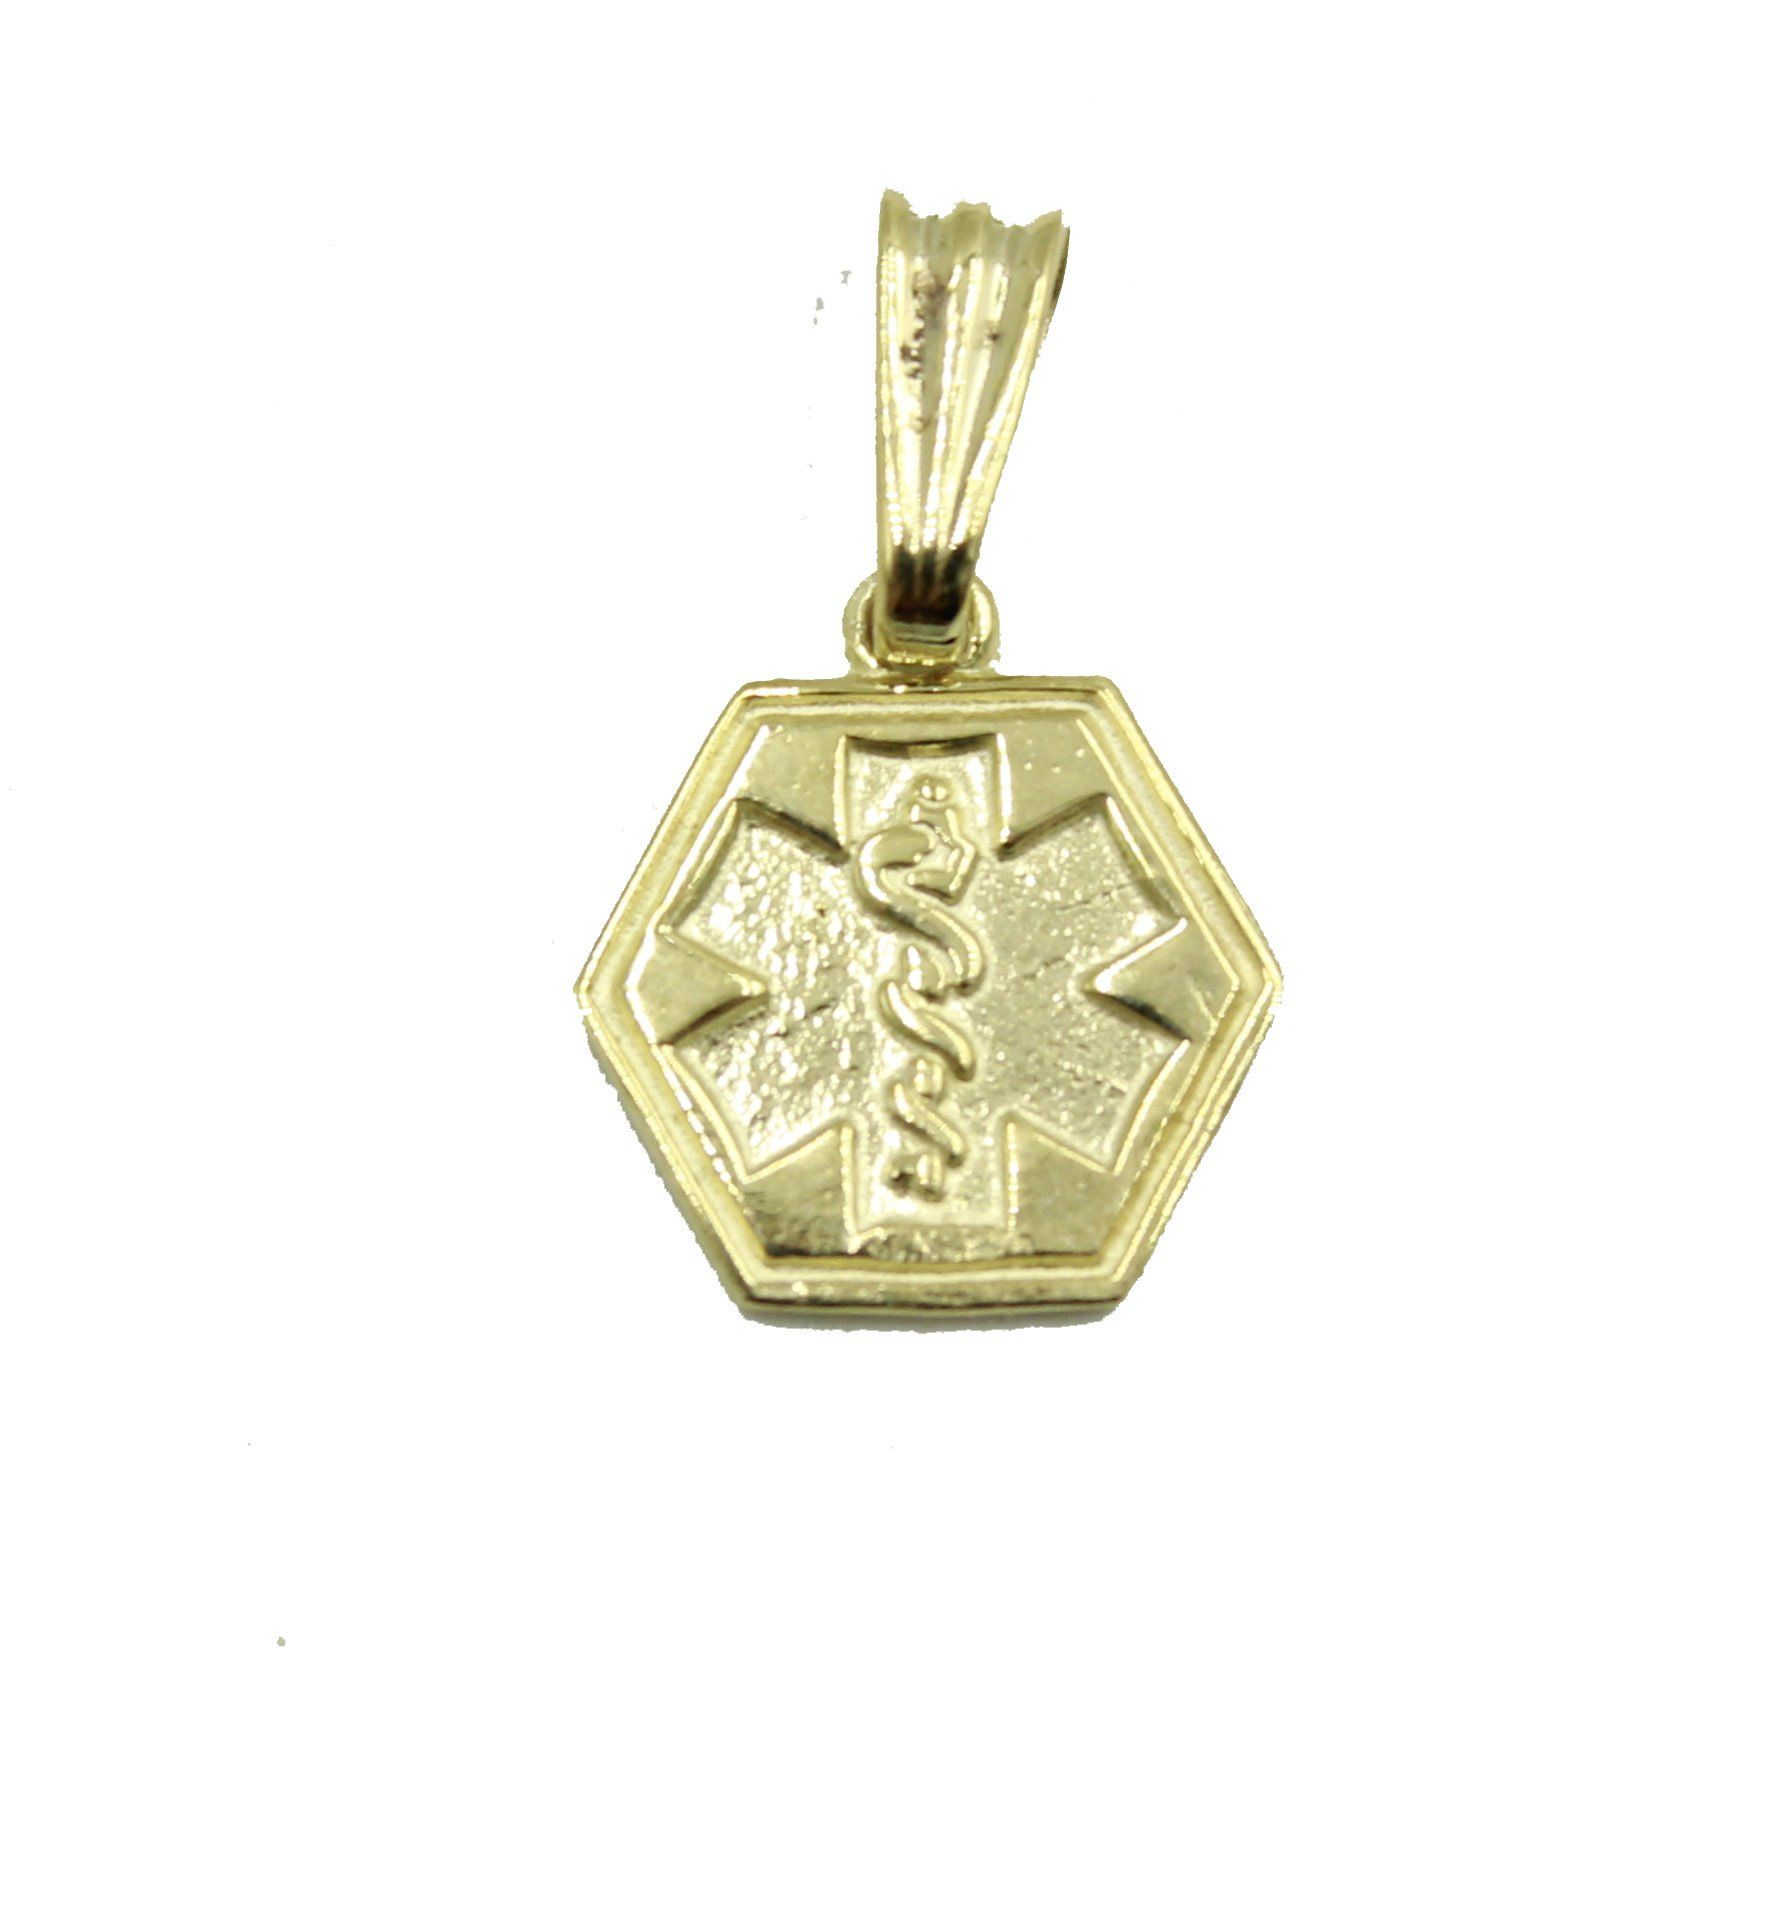 14k Yellow Gold Medical Alert Cadeusus Pendant